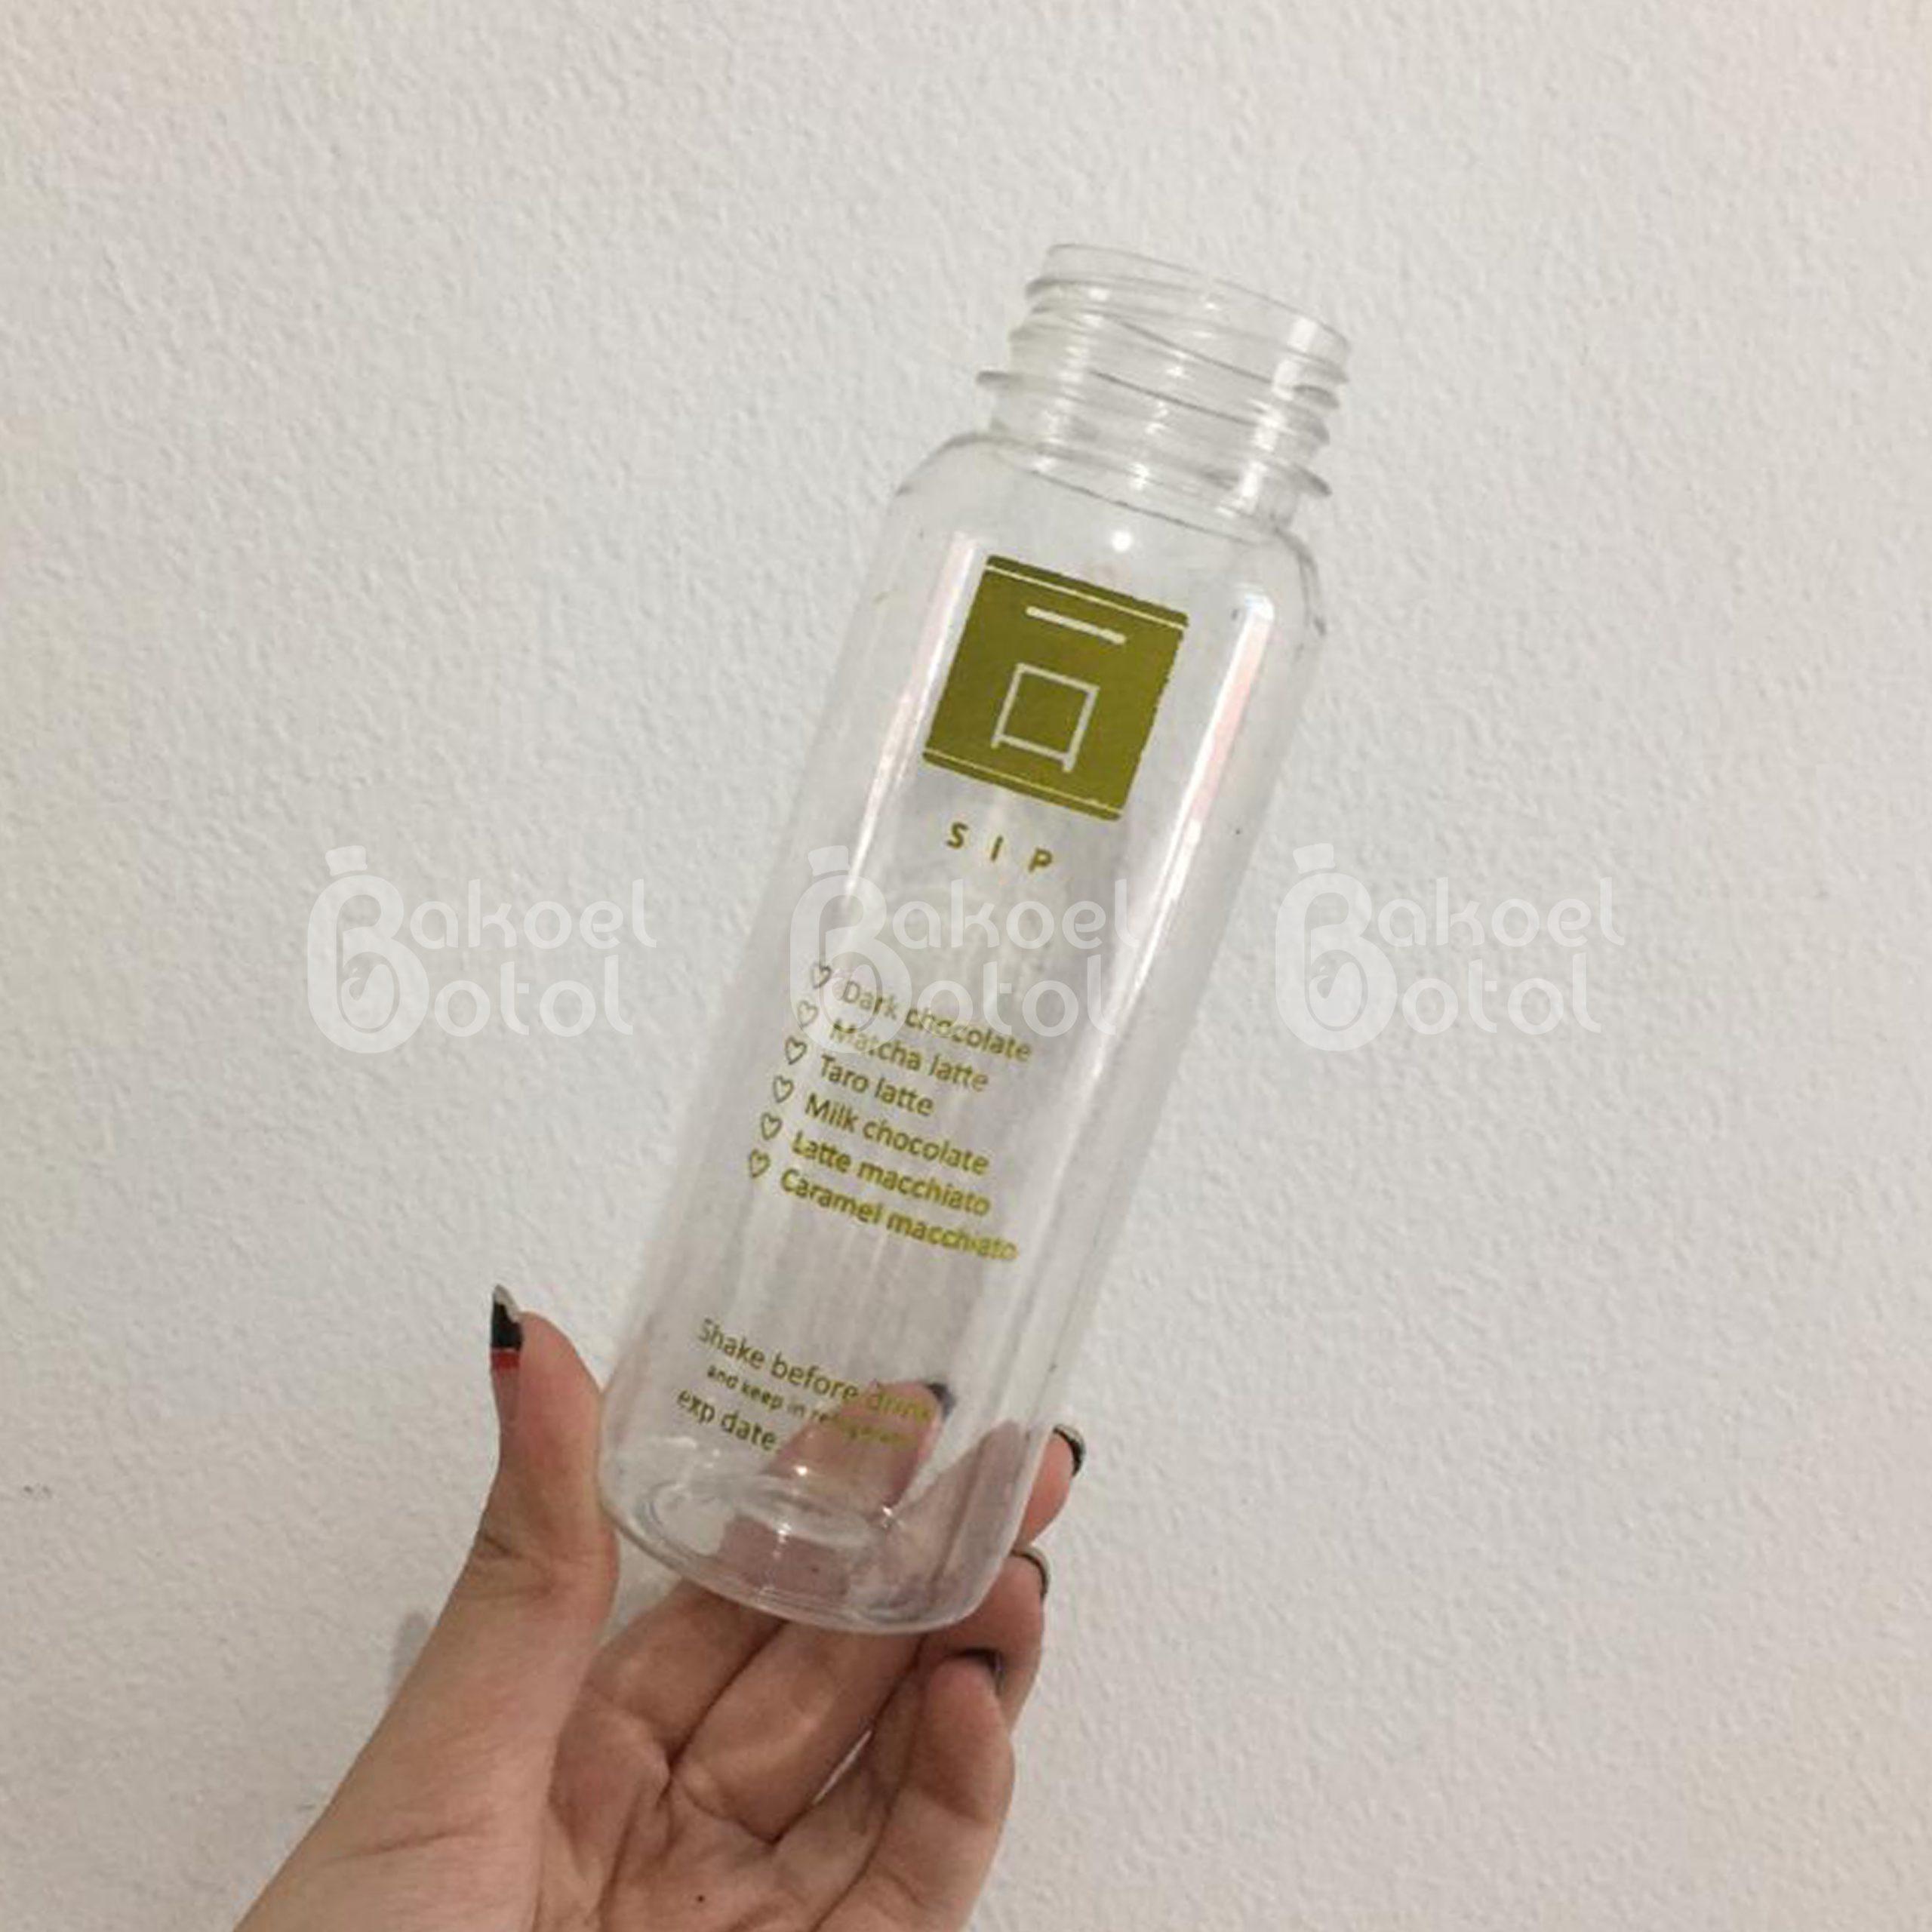 Sablon botol dan Gelas Plastik Berkualitas